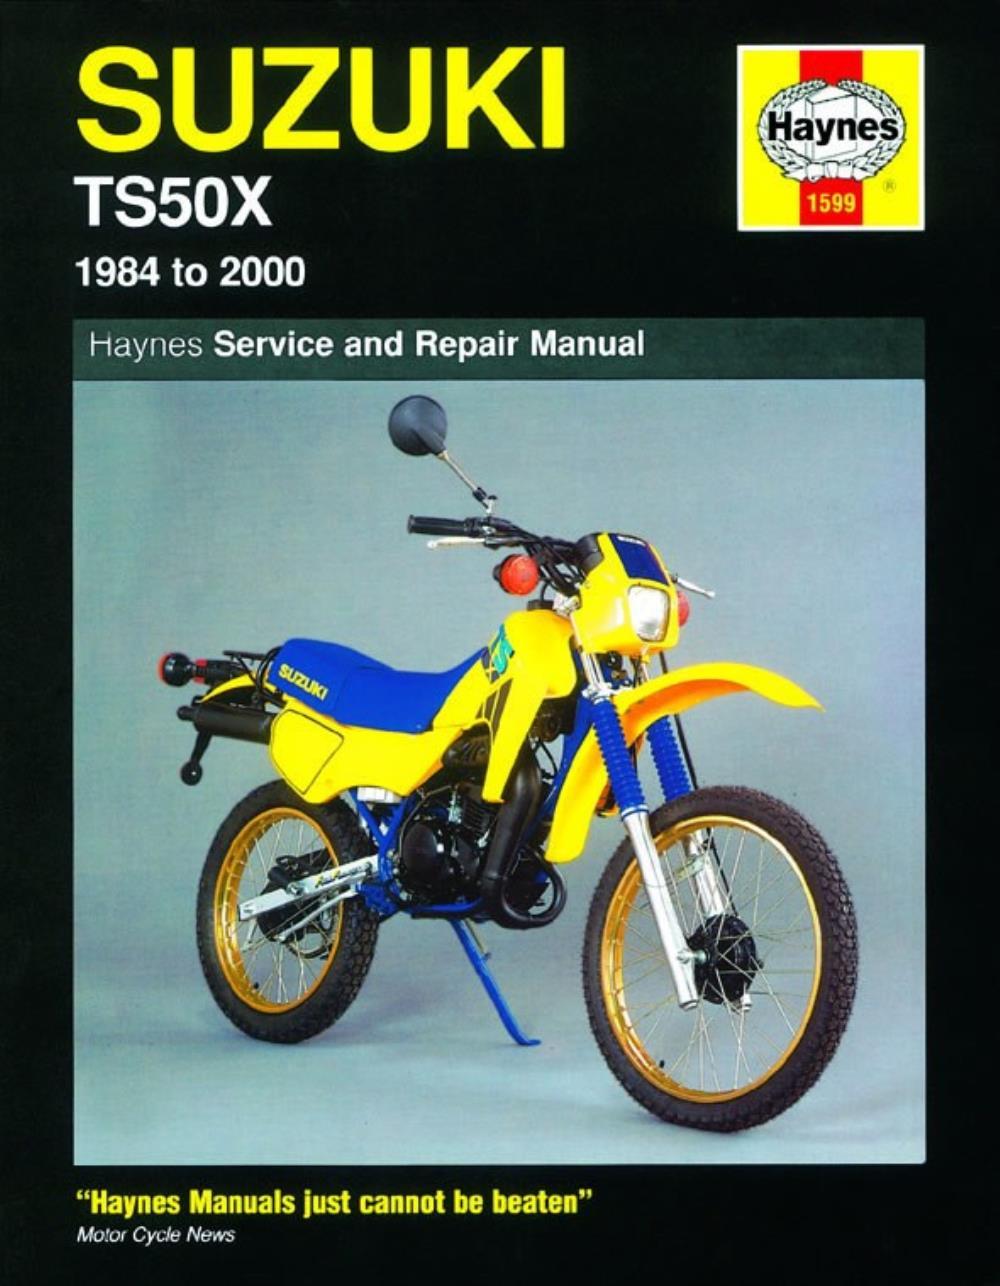 medium resolution of haynes manual 1599 for suzuki ts50x 1984 to 2000 for sale online ebay suzuki ts50x wiring diagram free